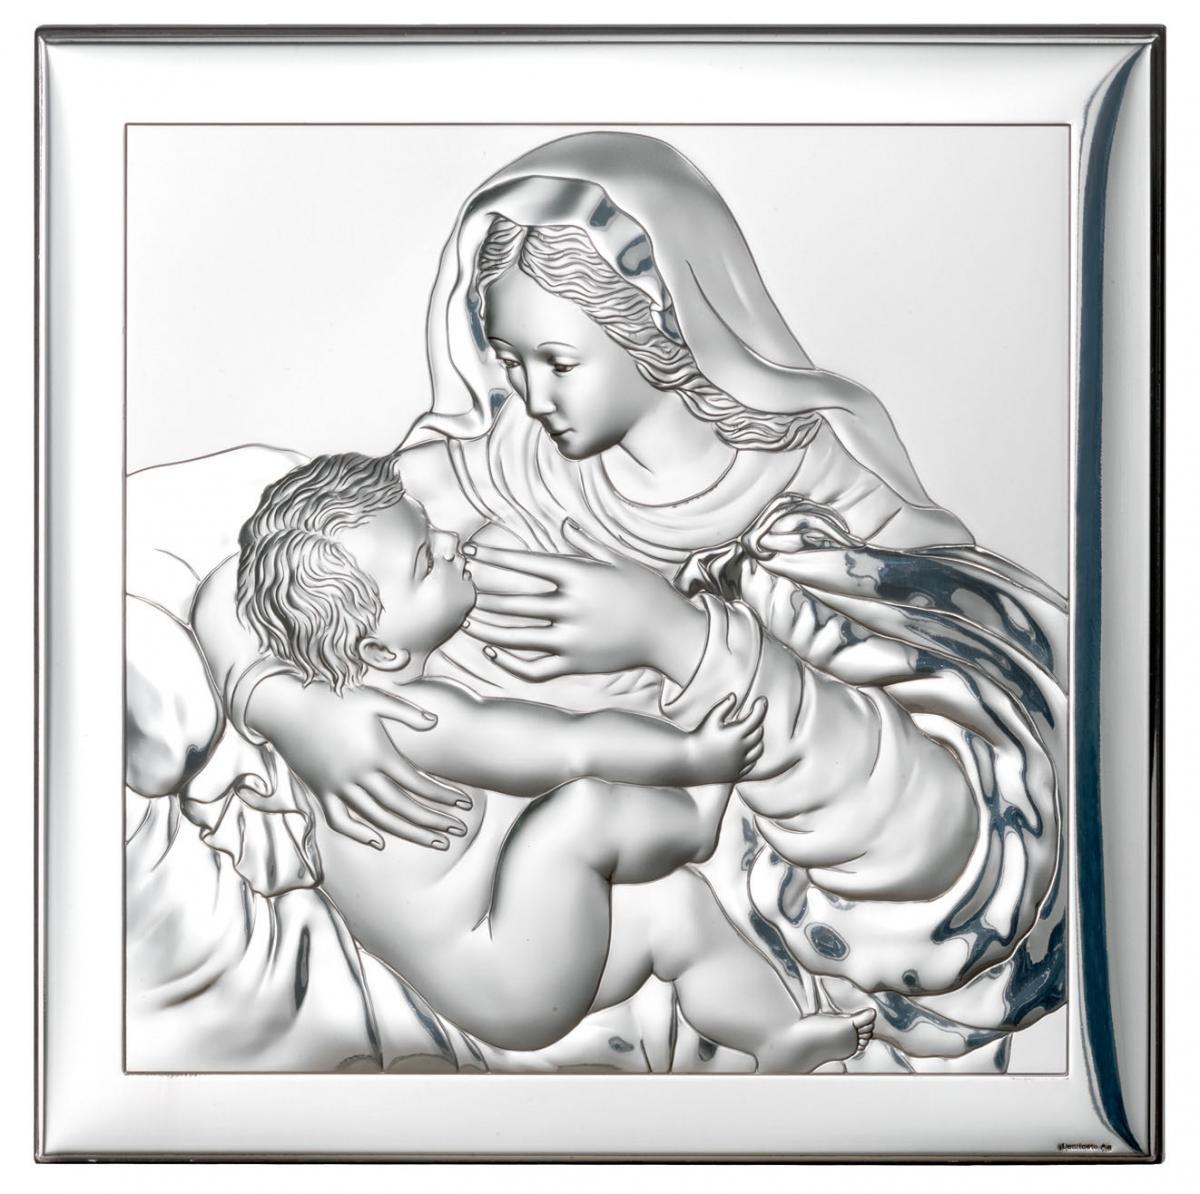 Ікона срібна Матір Божа Годувальниця 18х18см 80002 4XL